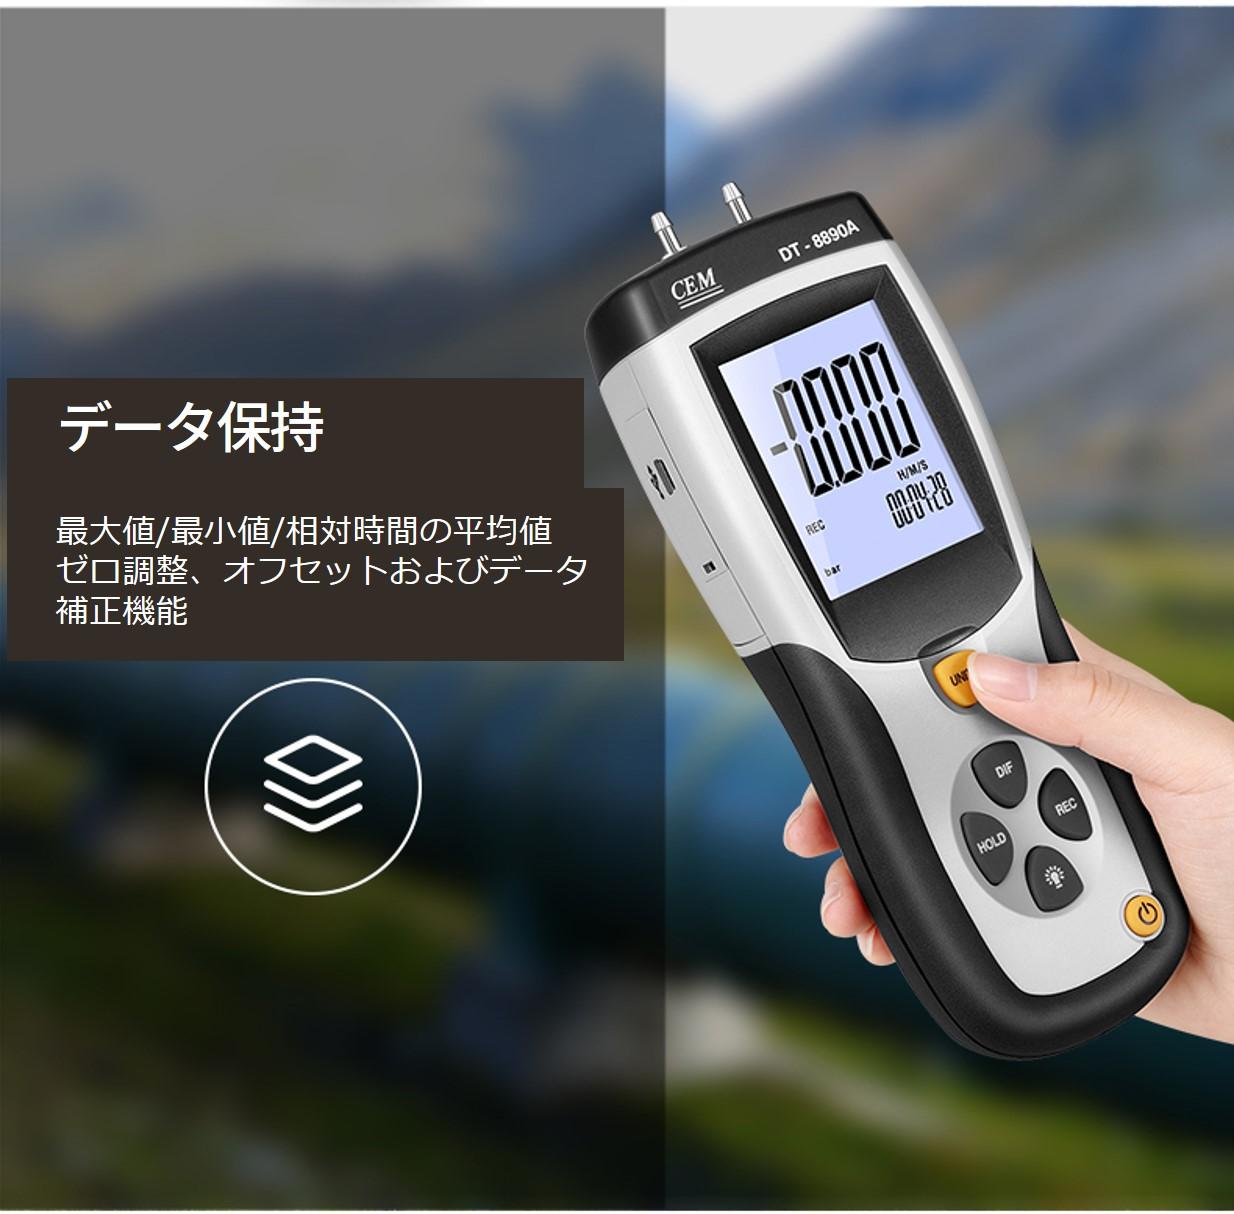 CEM 微差圧計マノメーター DT-8890A